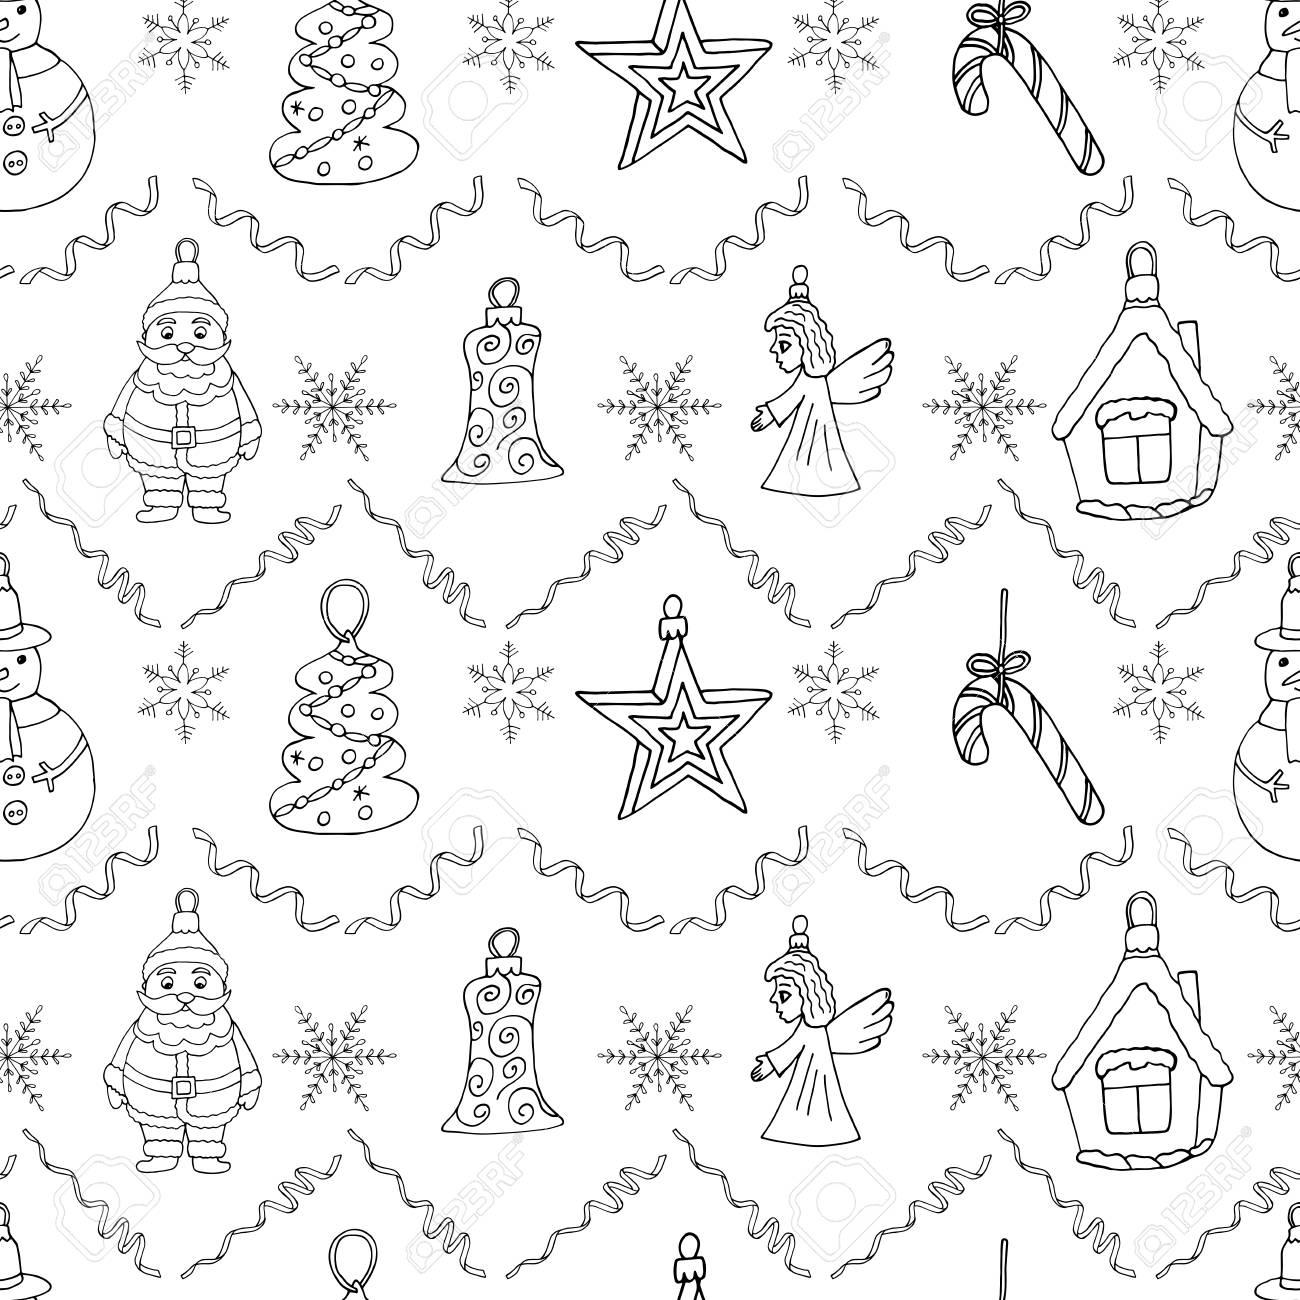 Christmas Drawing.Christmas Drawing Illustration Hand Drawn Santa Claus Tree